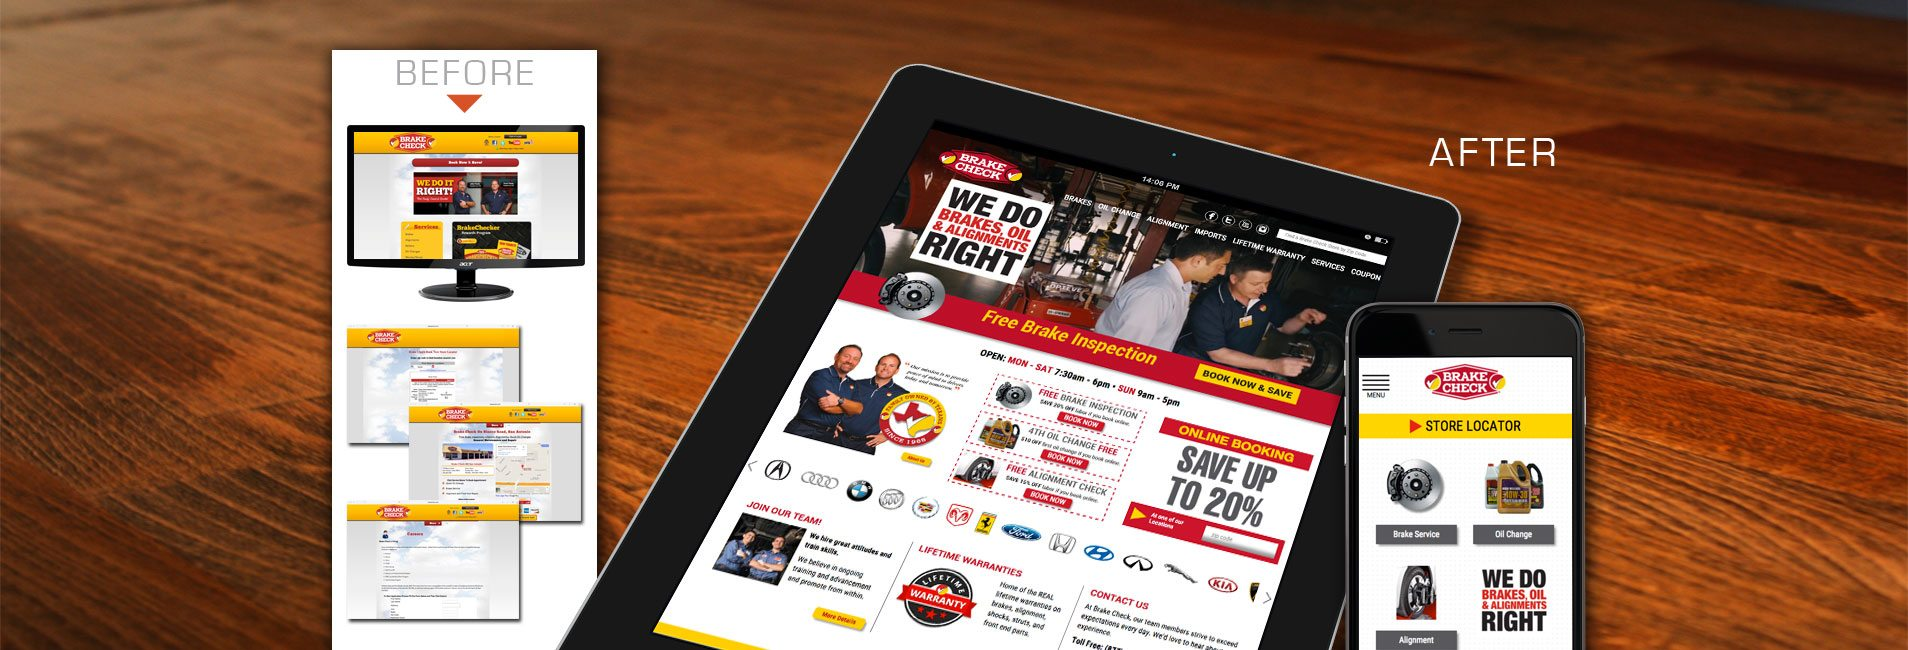 Before & After : Benson Web Design Company San Antonio TX